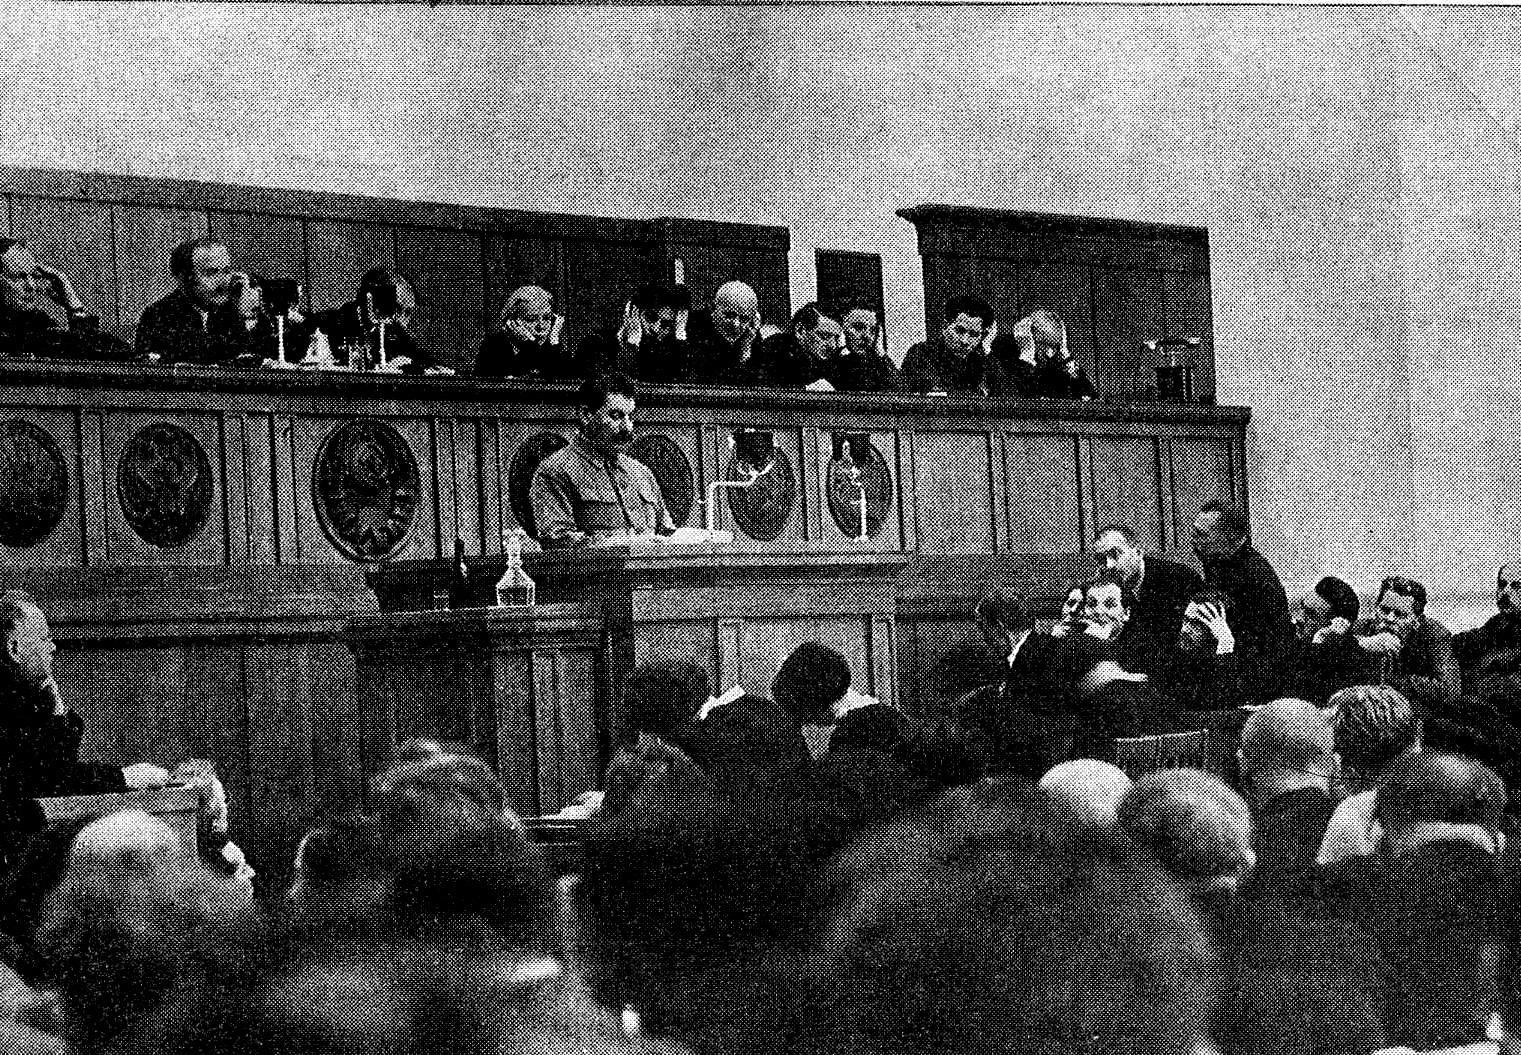 https://upload.wikimedia.org/wikipedia/commons/1/11/17th_Congress_AUCP-4.jpg